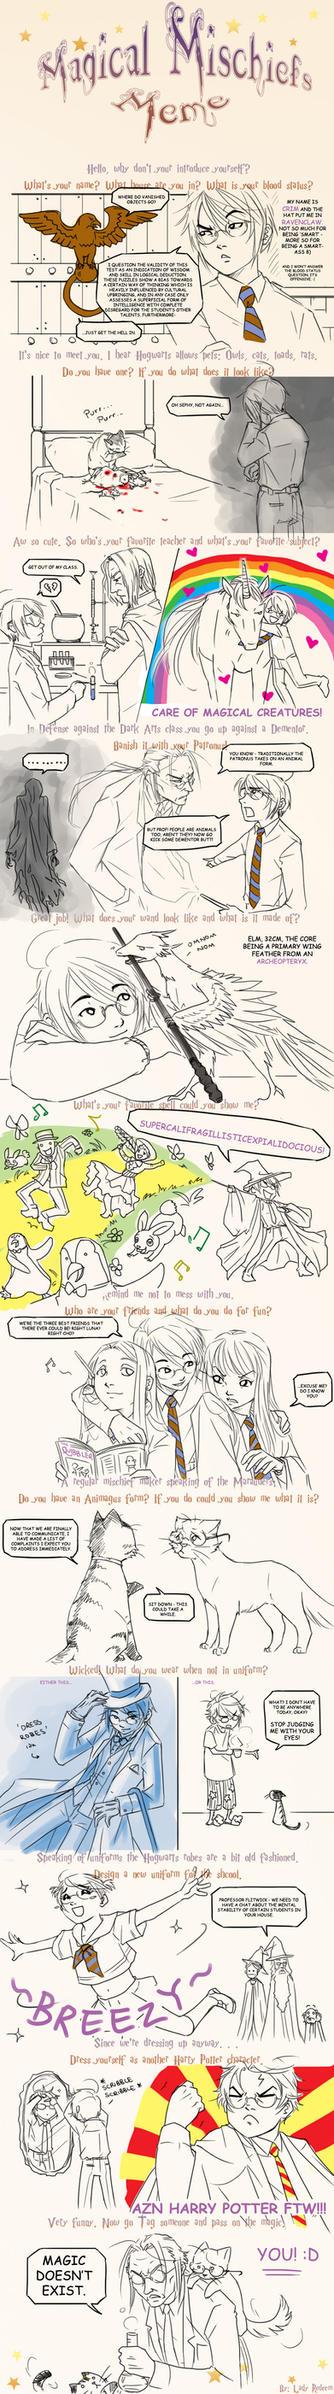 Harry Potter meme by CrimsonSun